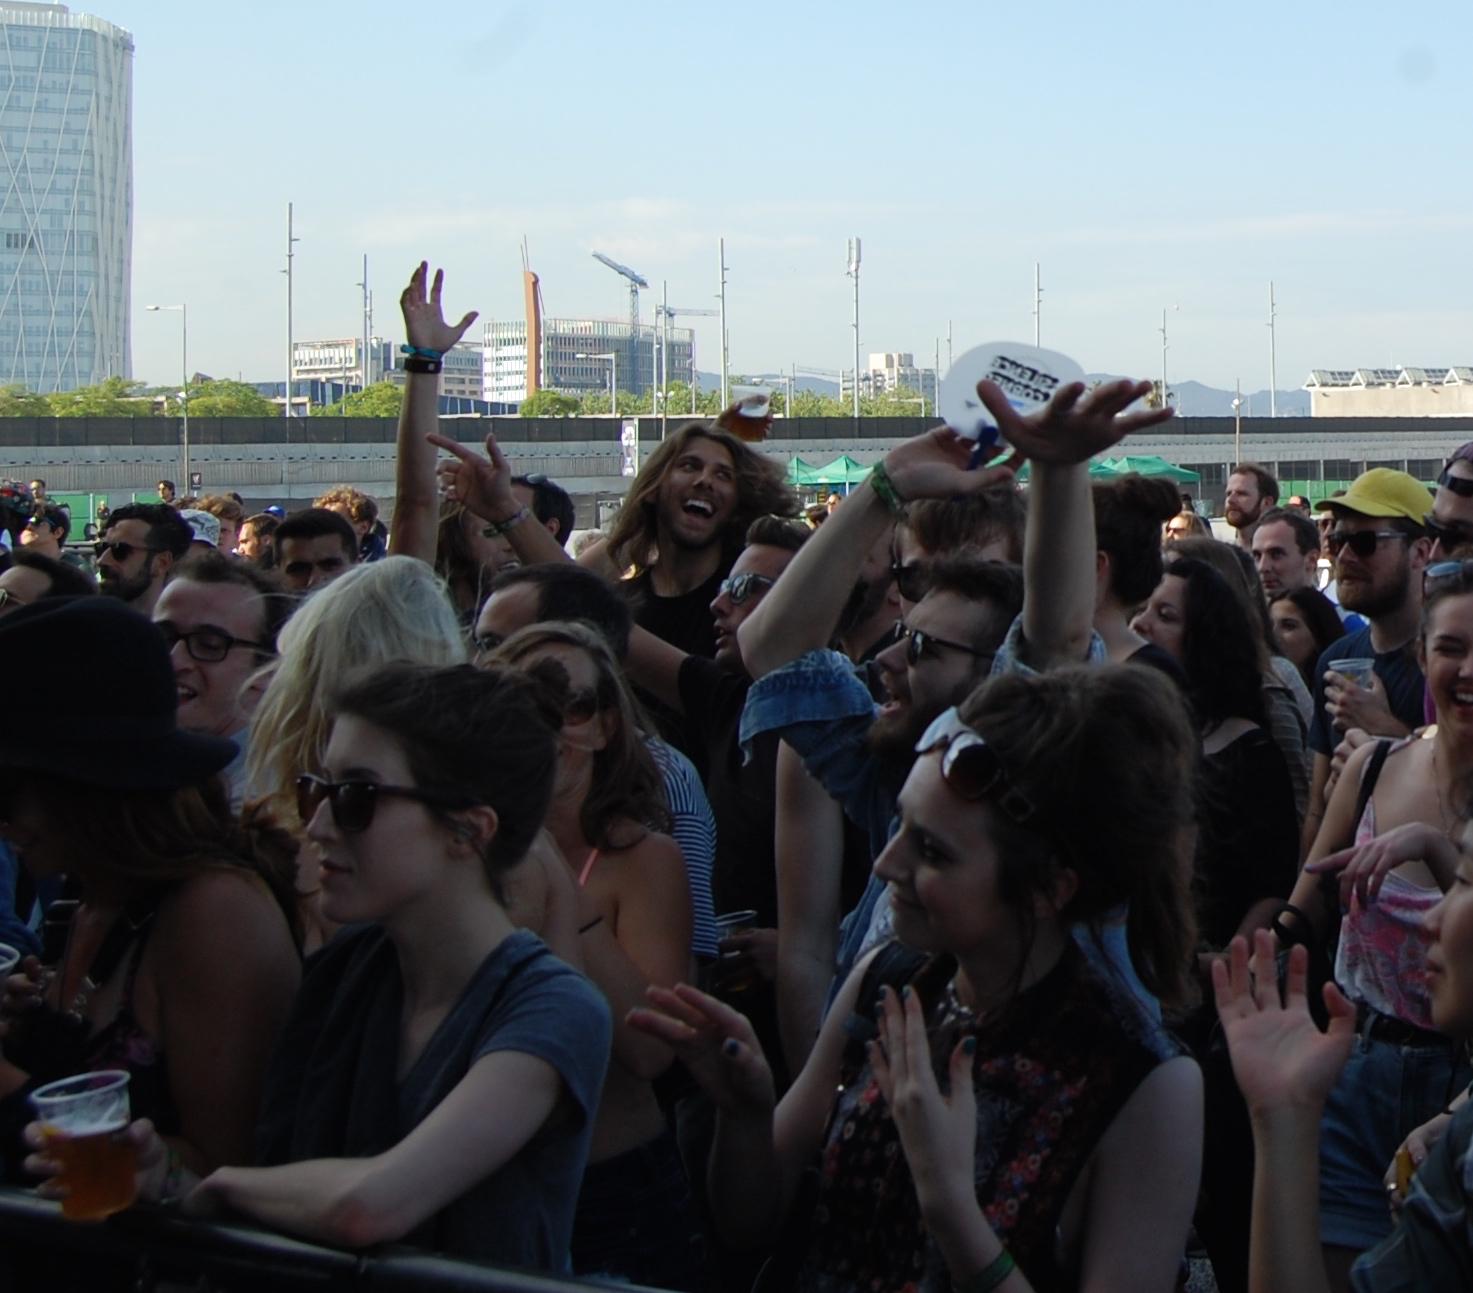 Sylvan Esso Crowd // Photo by Adam Kivel